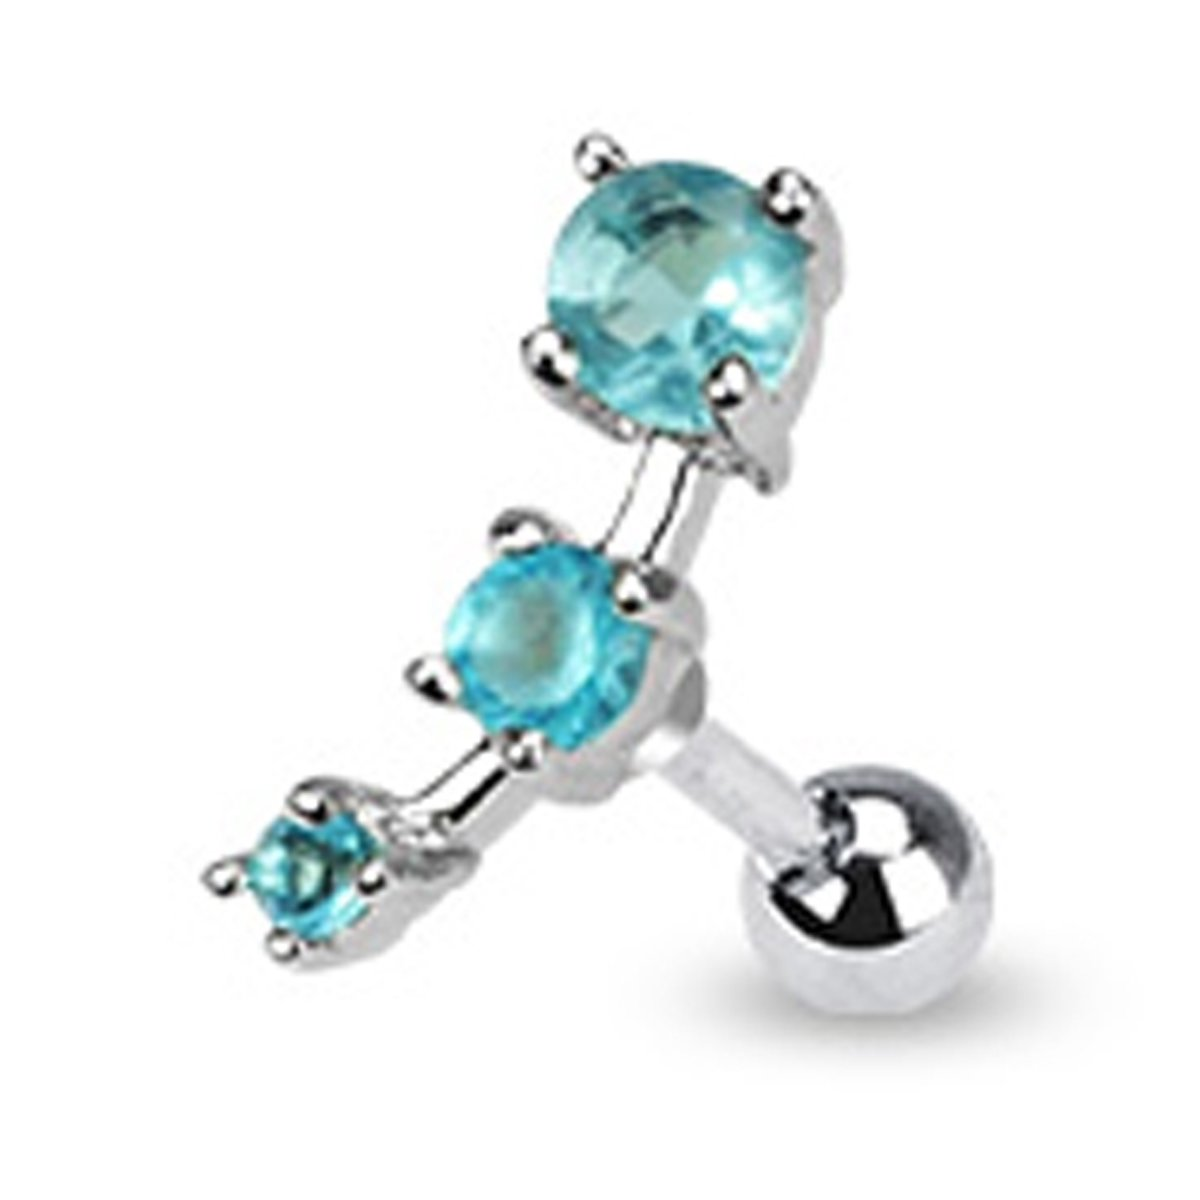 Helix piercing 3 steentjes vierkant aqua ©LMPiercings kopen